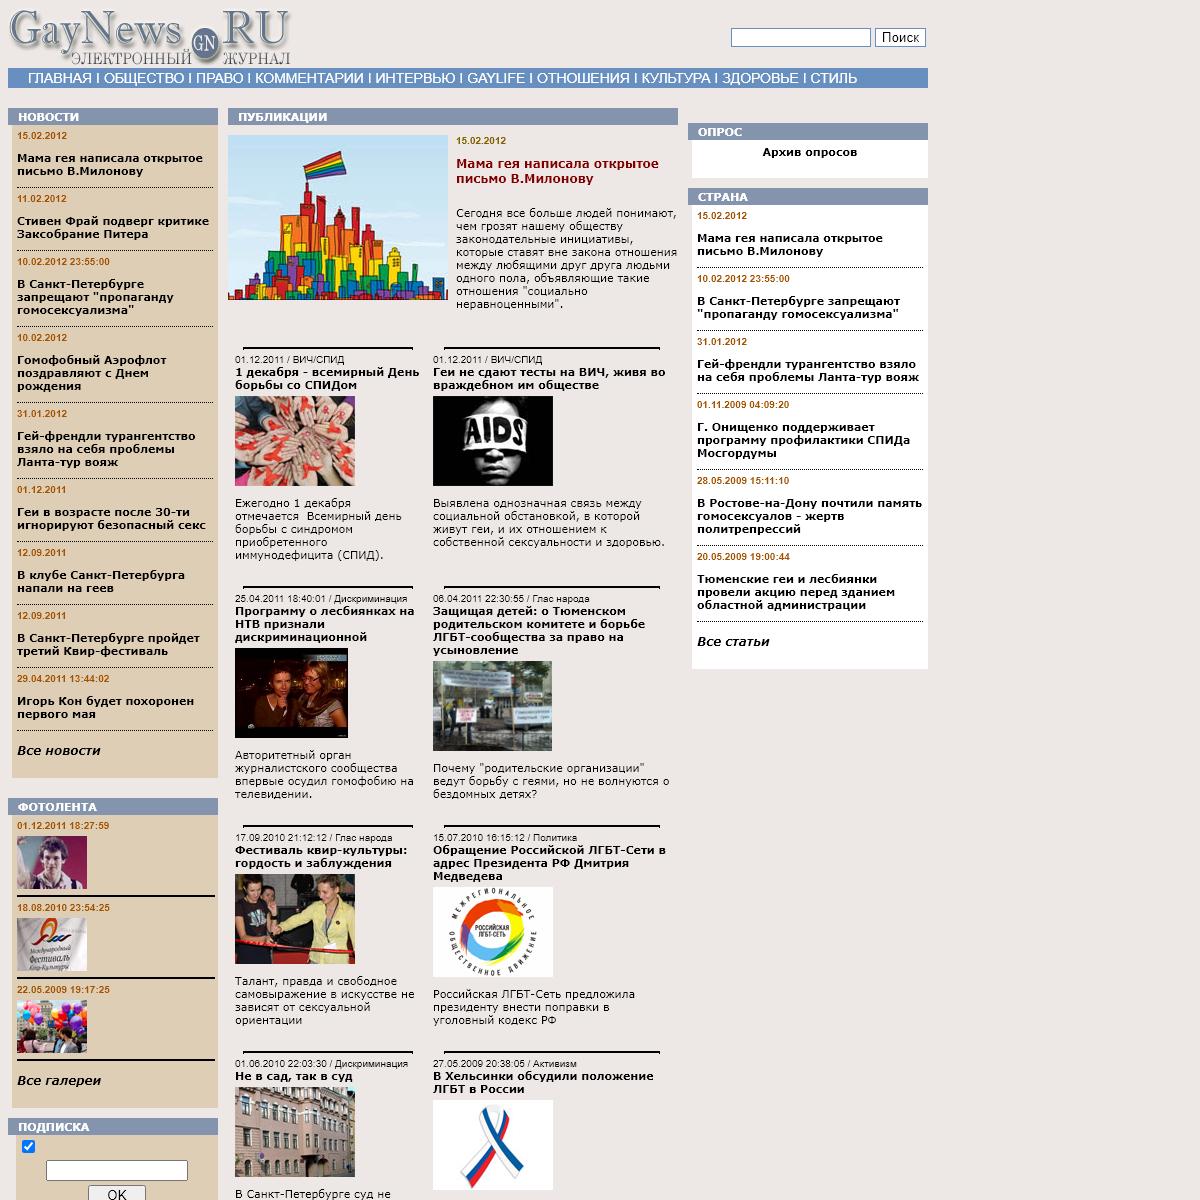 GayNews